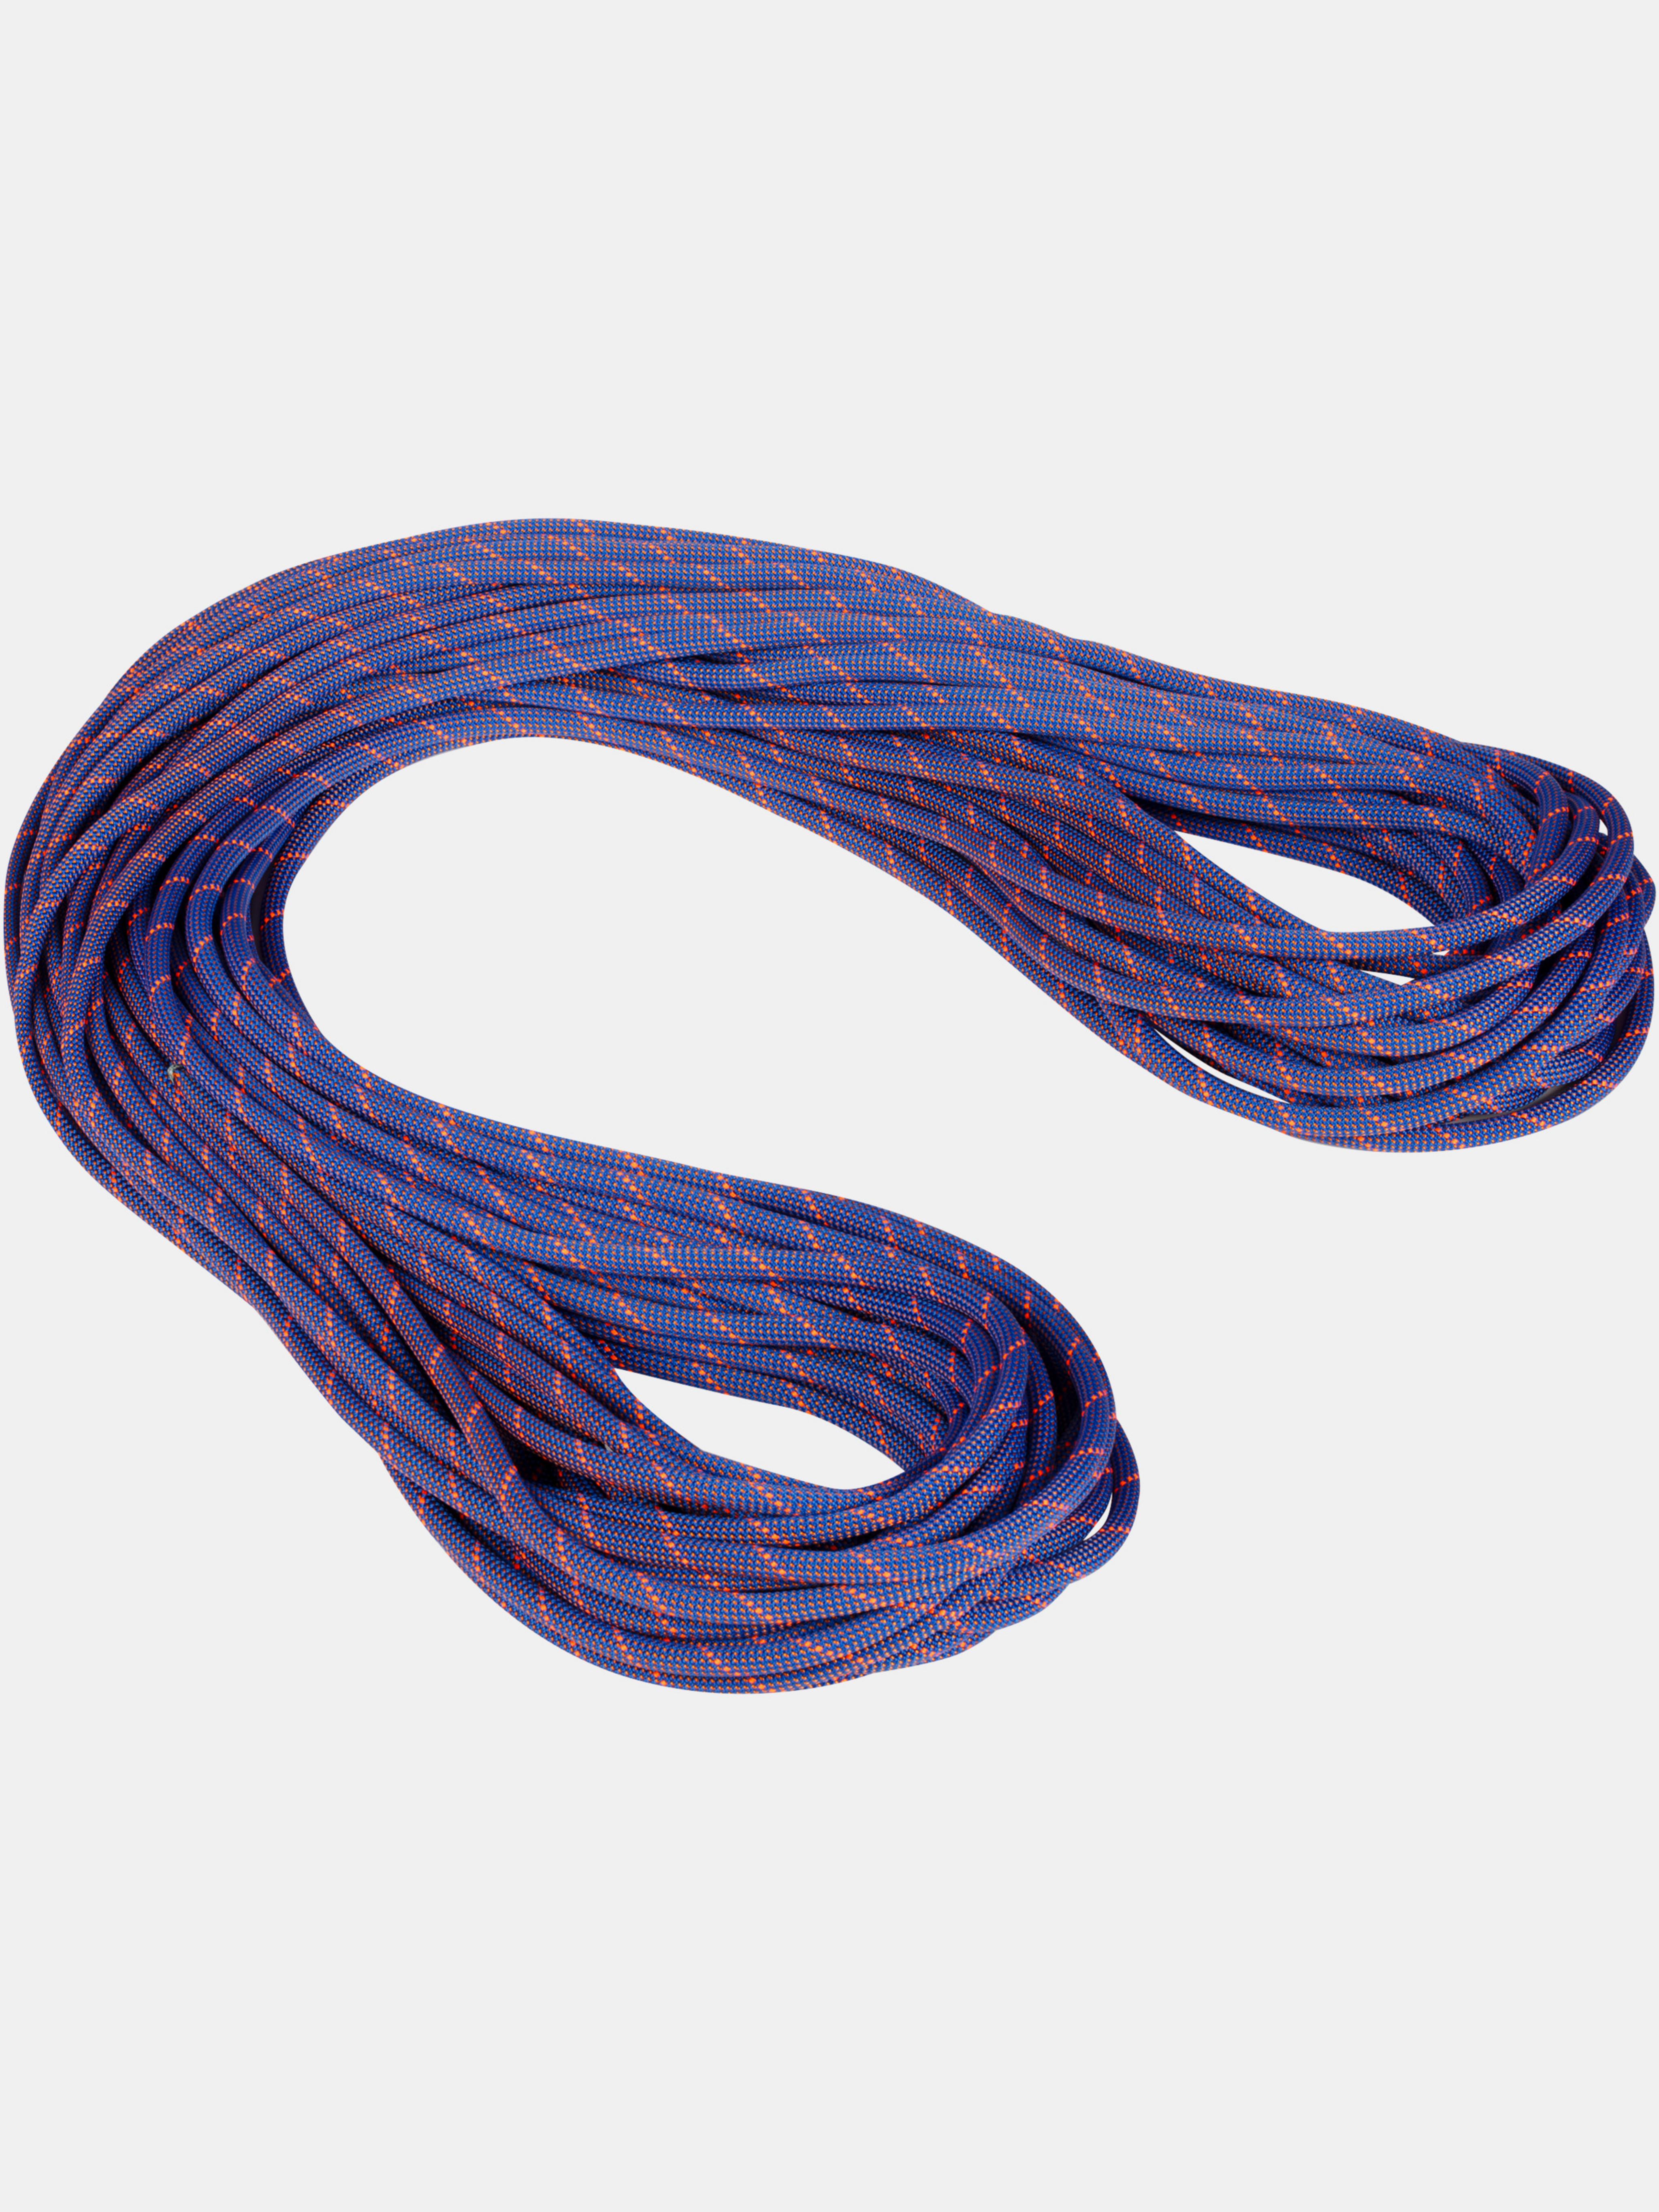 9.0 Crag Sender Dry Rope thumbnail